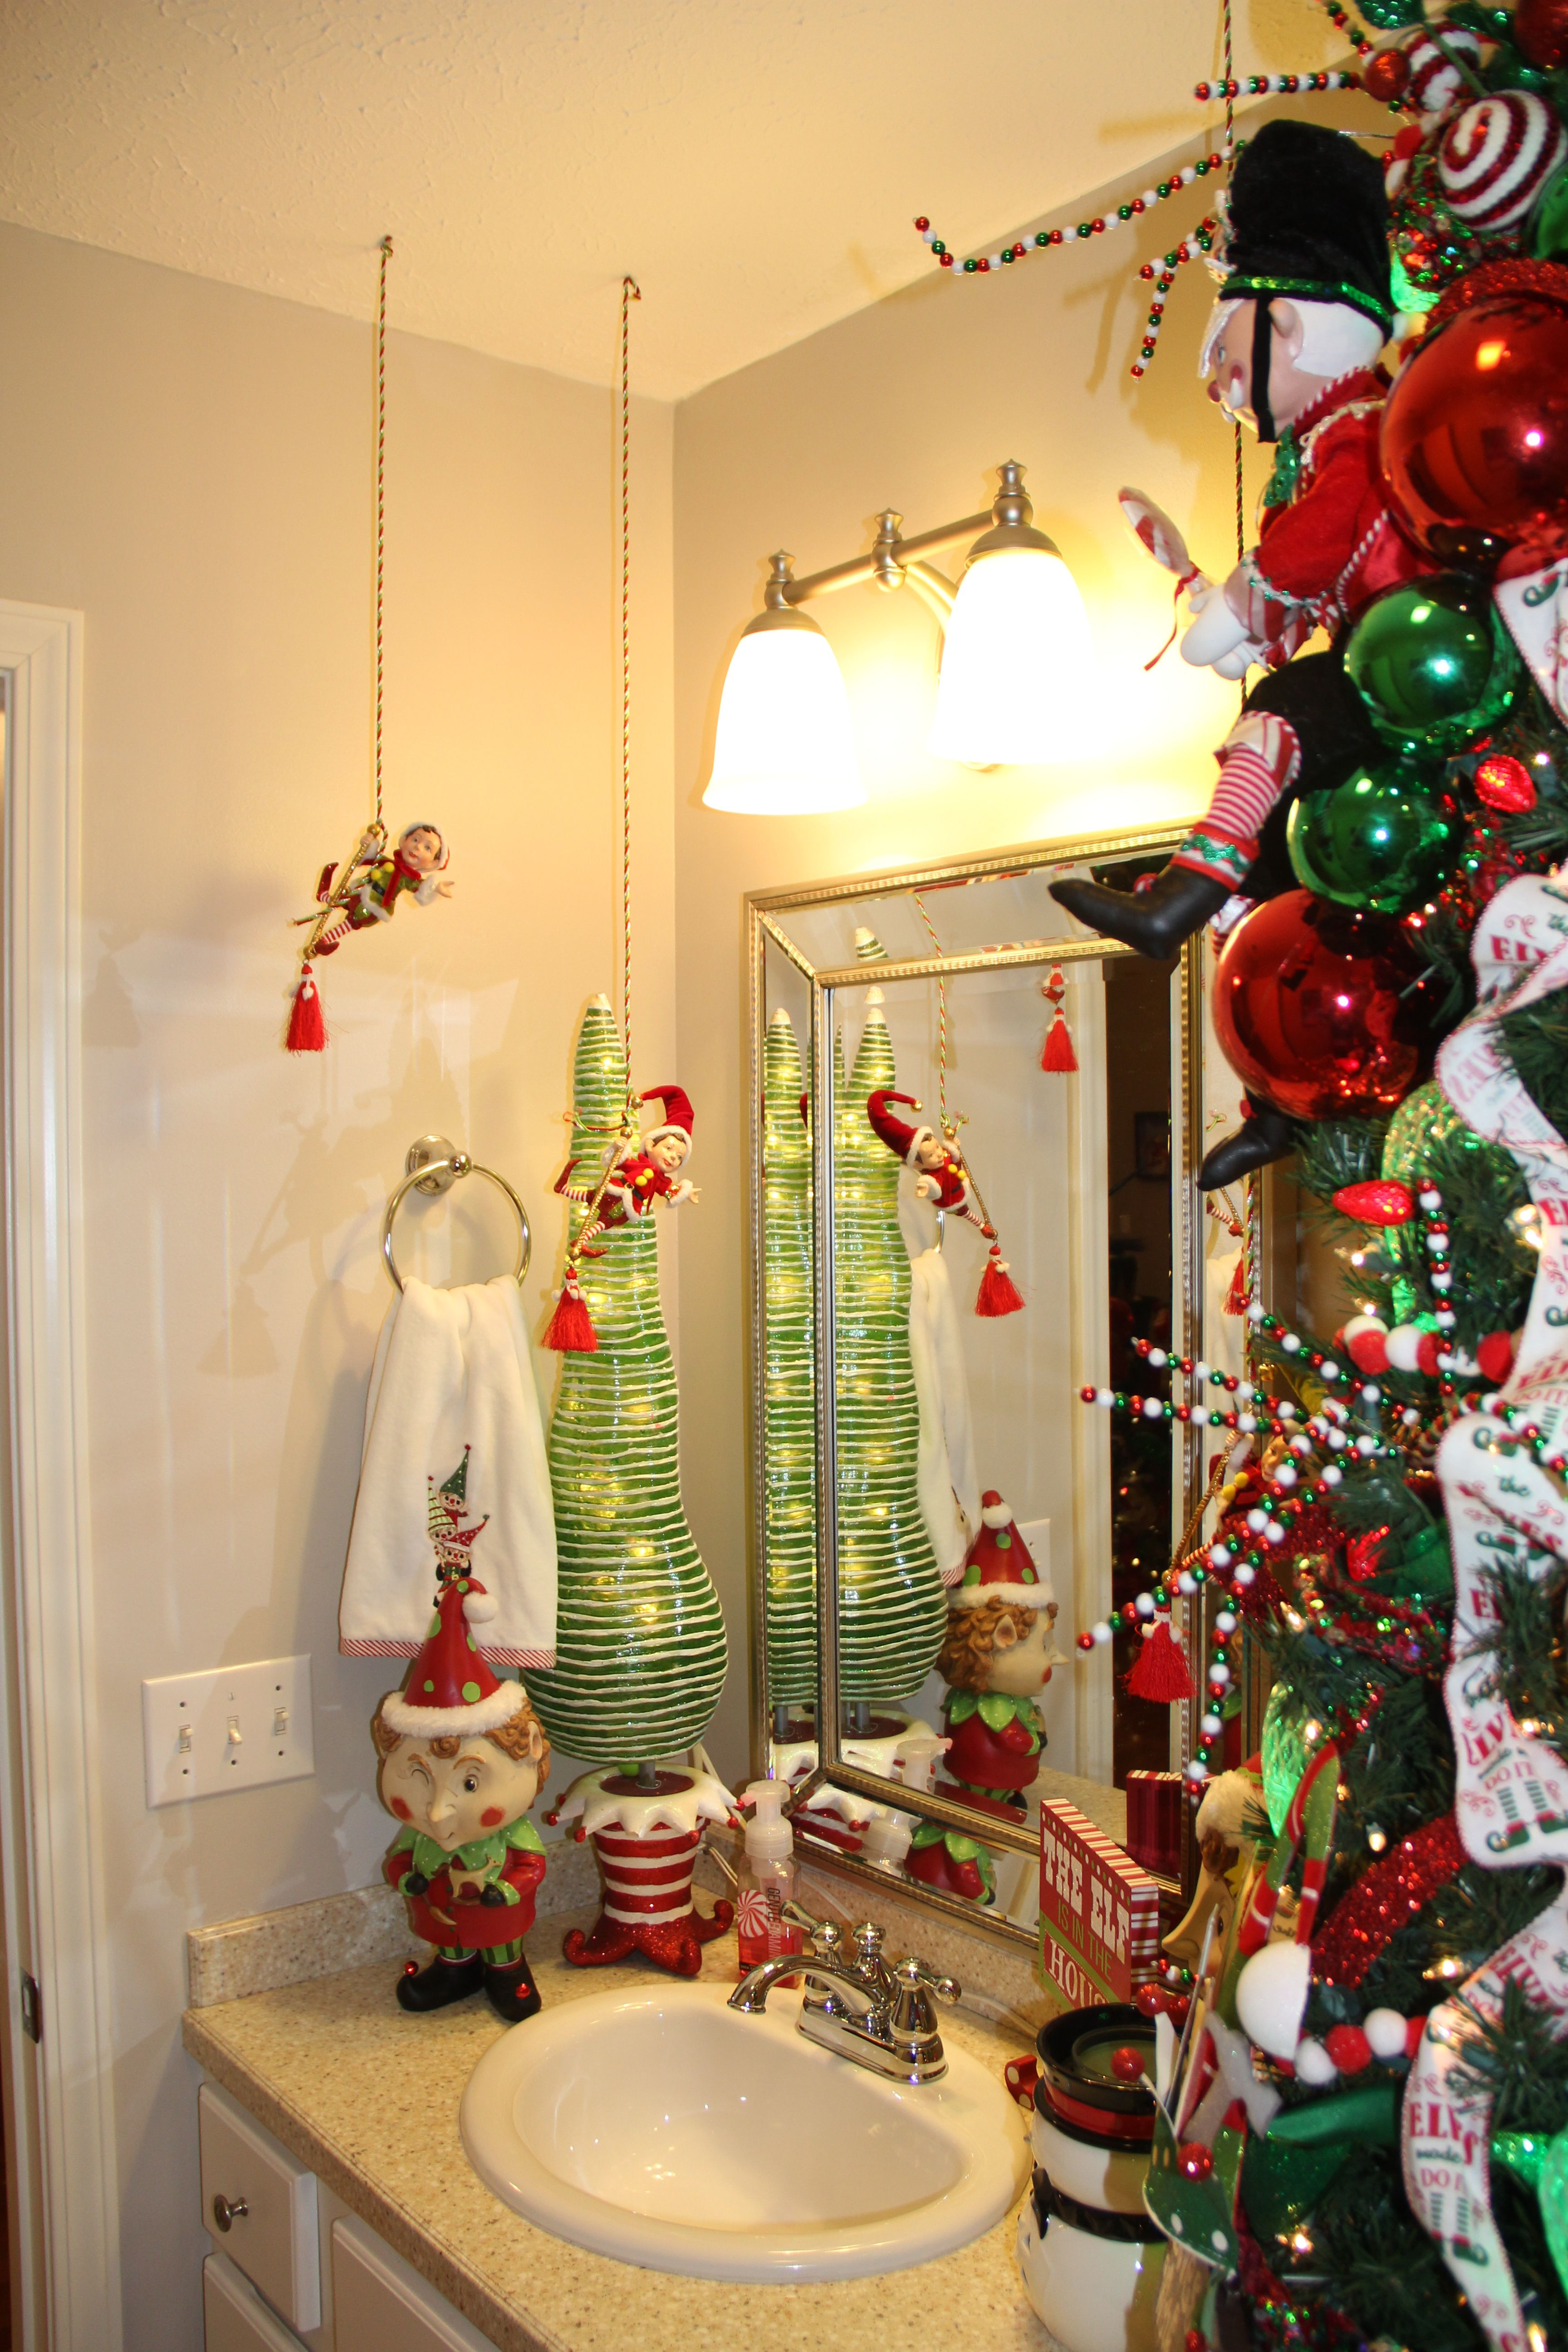 Pin by Travis Collis on My festive house!!!! | Pinterest | Christmas ...